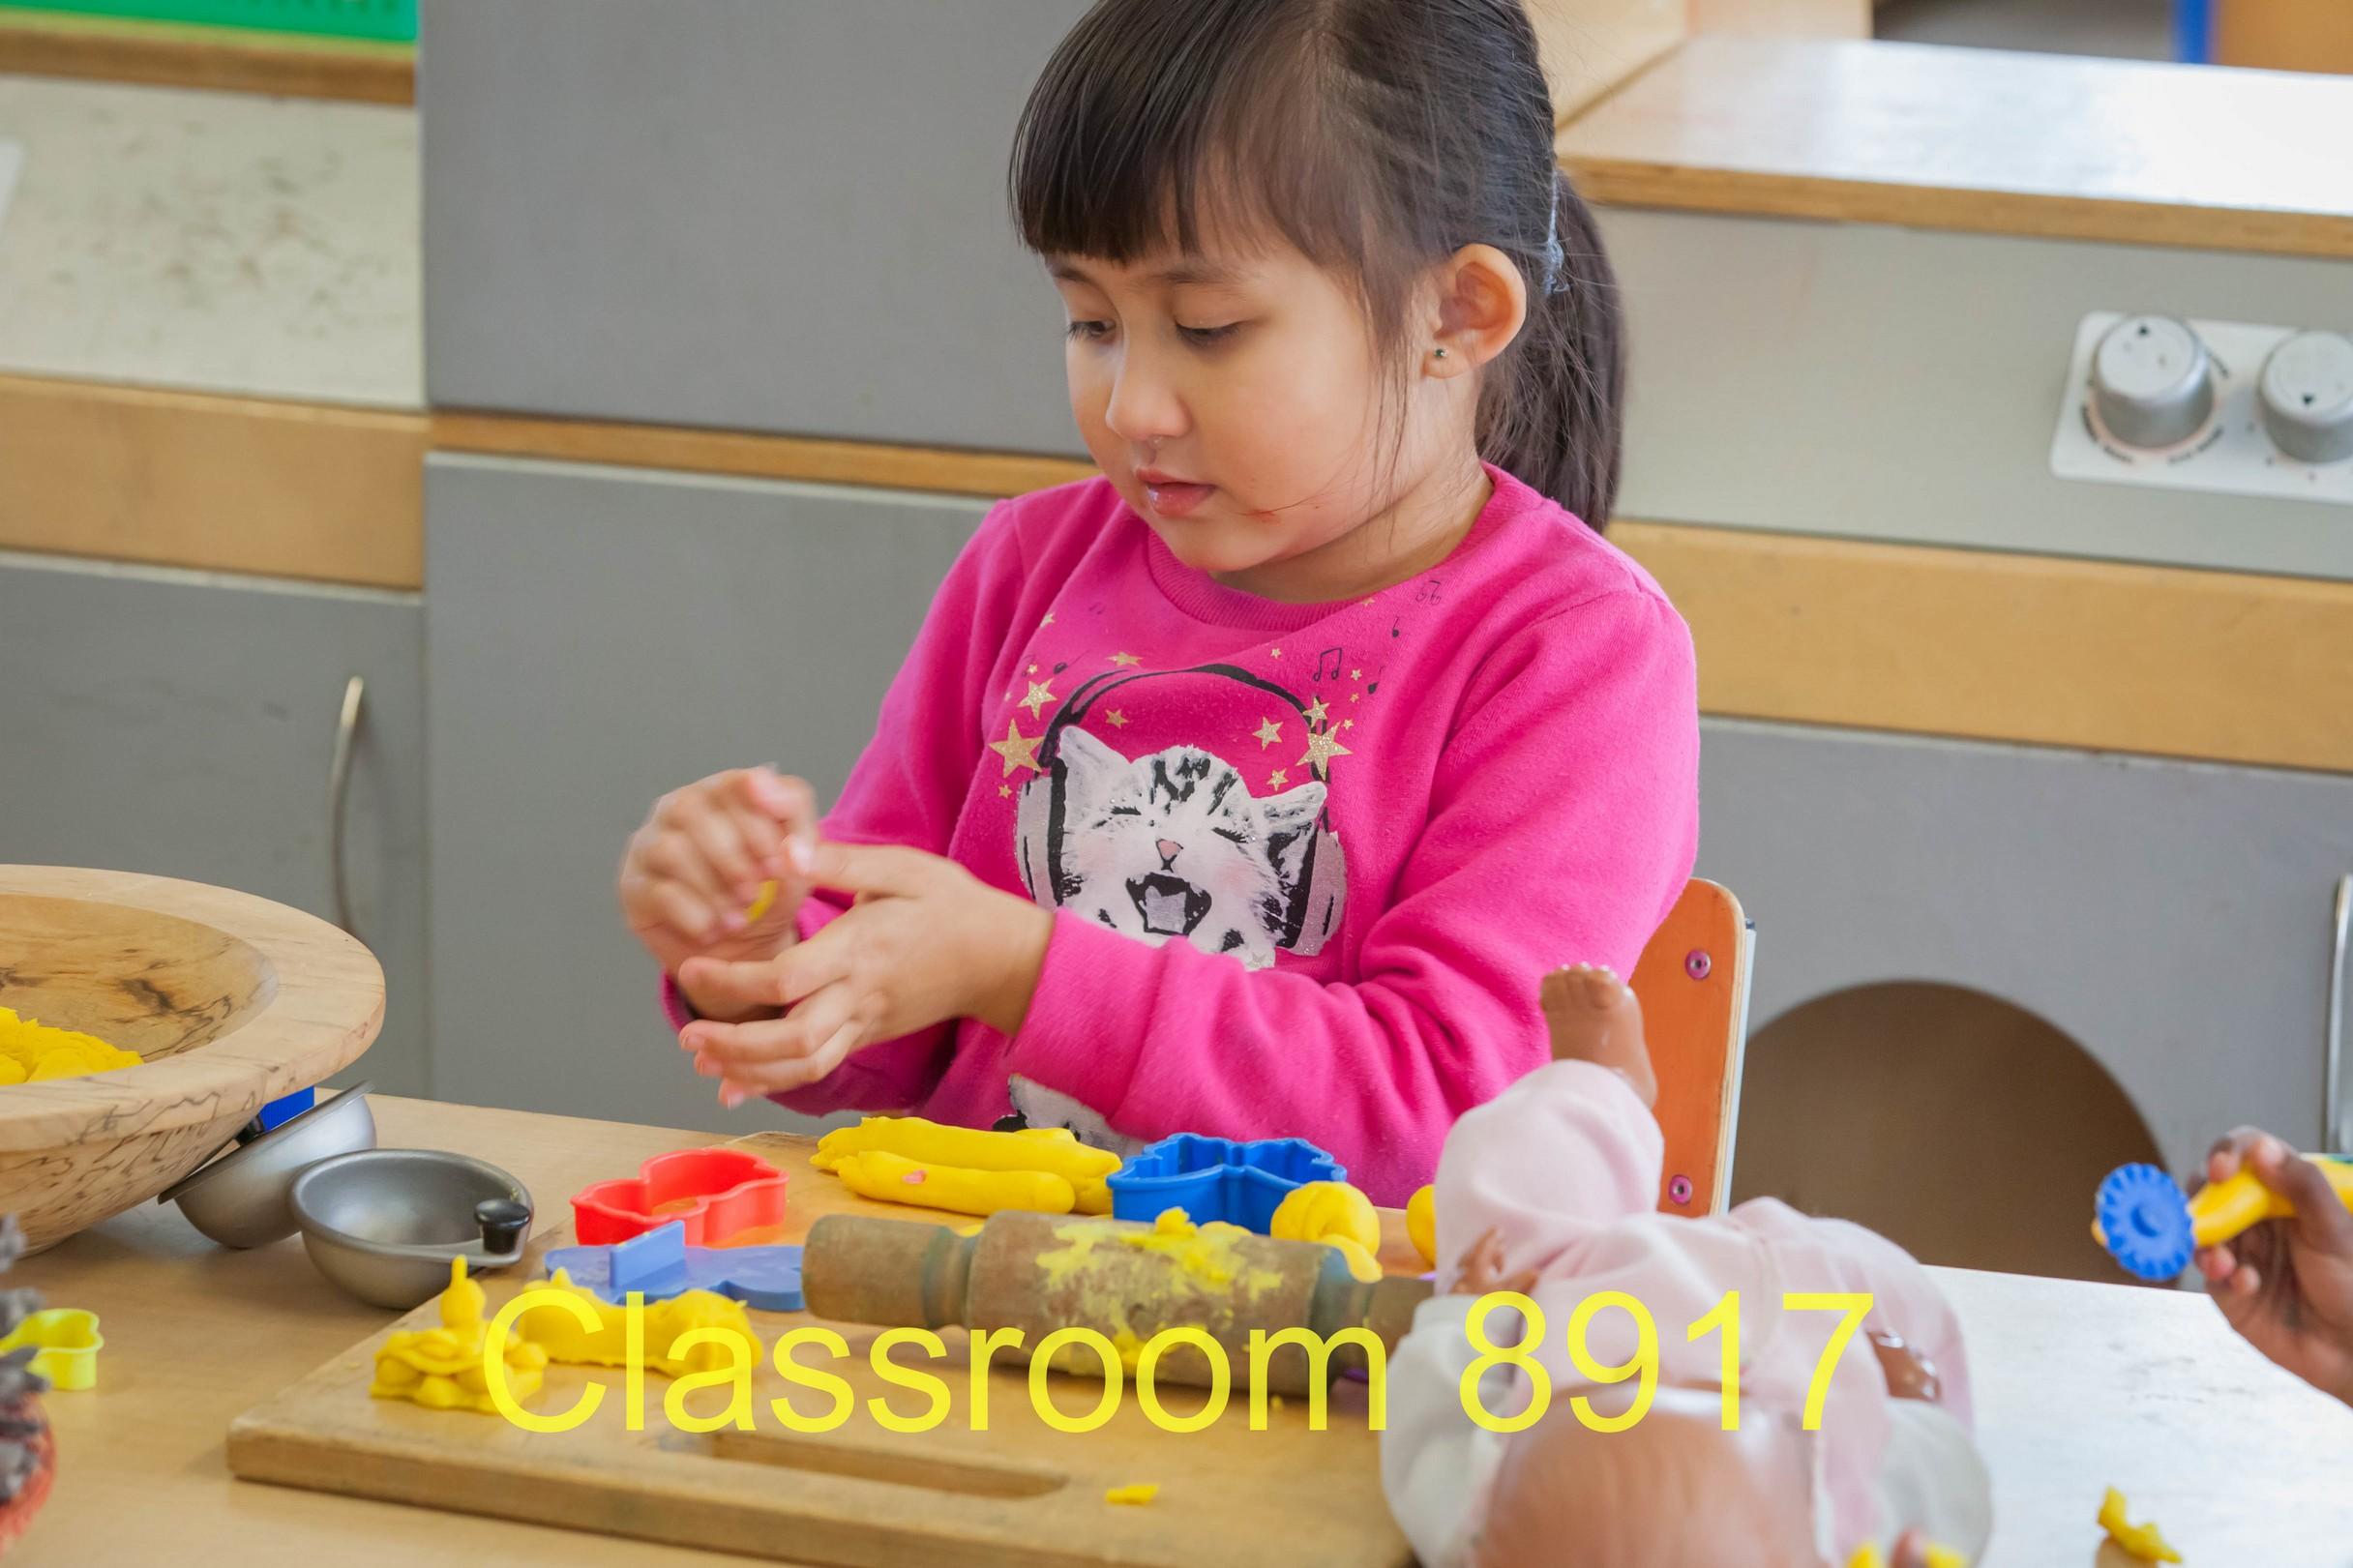 Classroom 8917